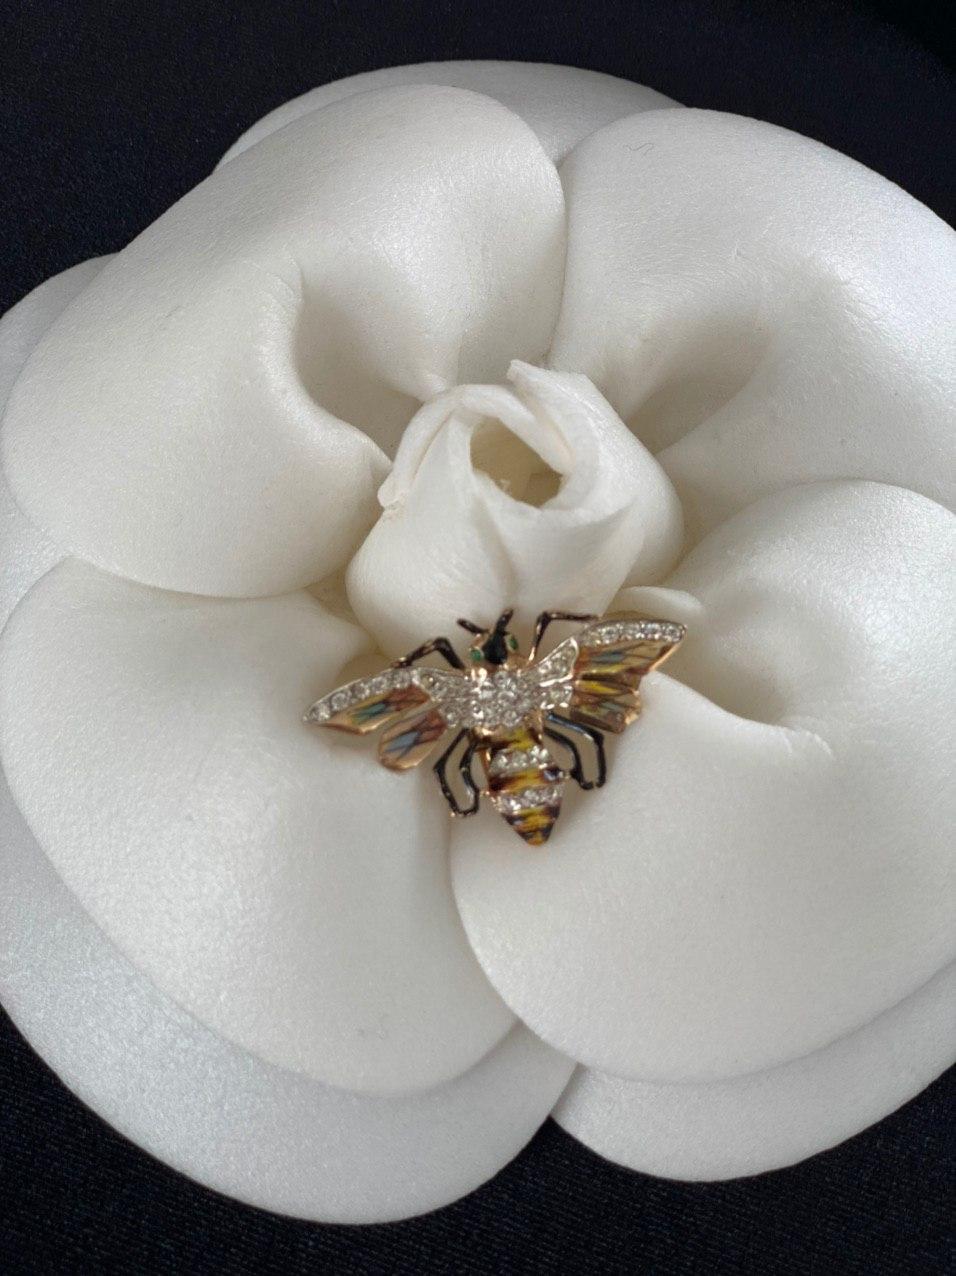 Серебряные коллекционные фур-клипы «Королевские Пчелы» Coro 1942 год, sterling